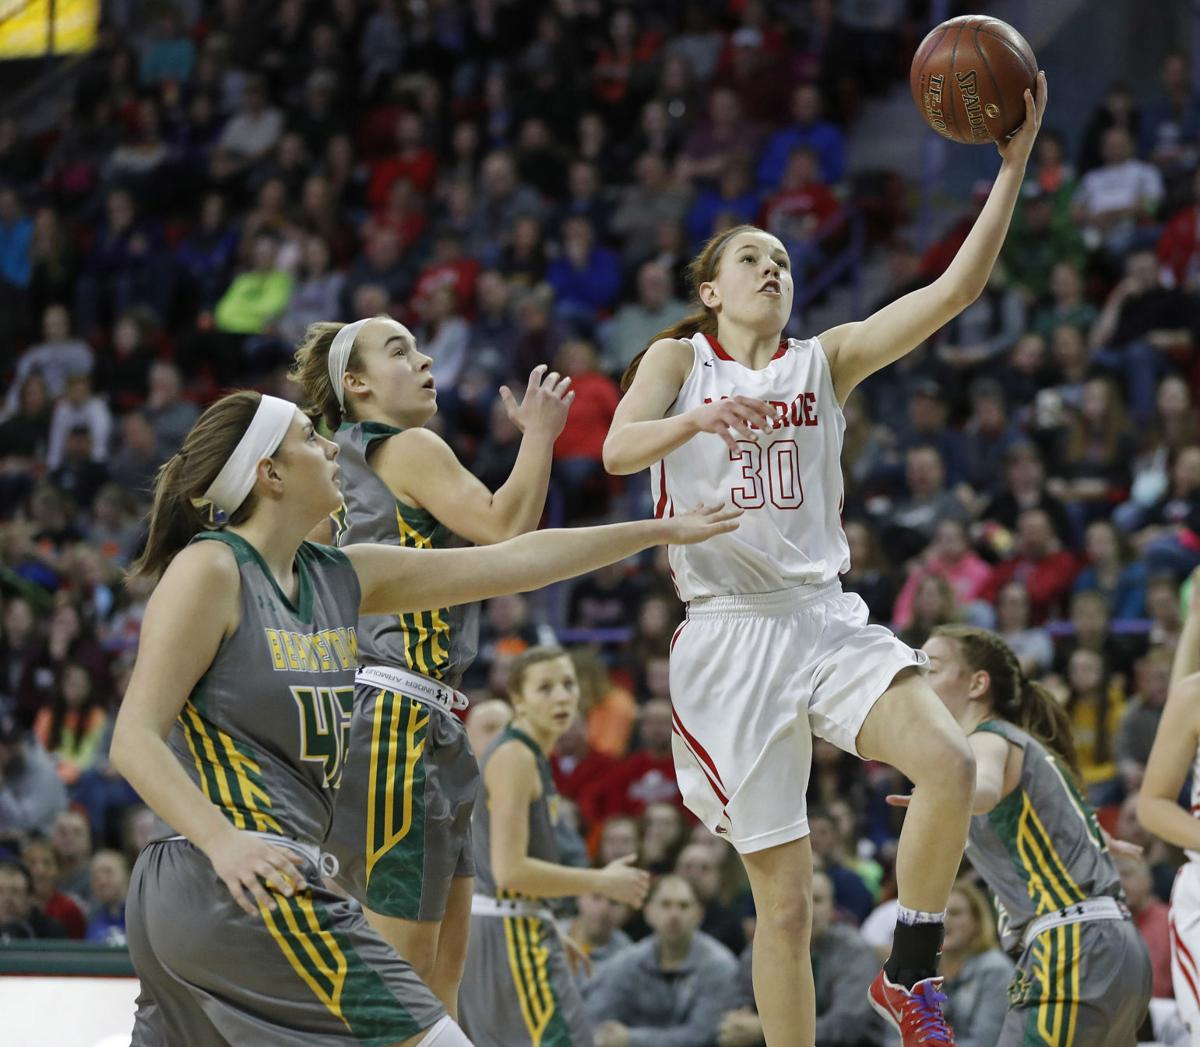 Pairings set for WIAA state girls basketball tournament ...